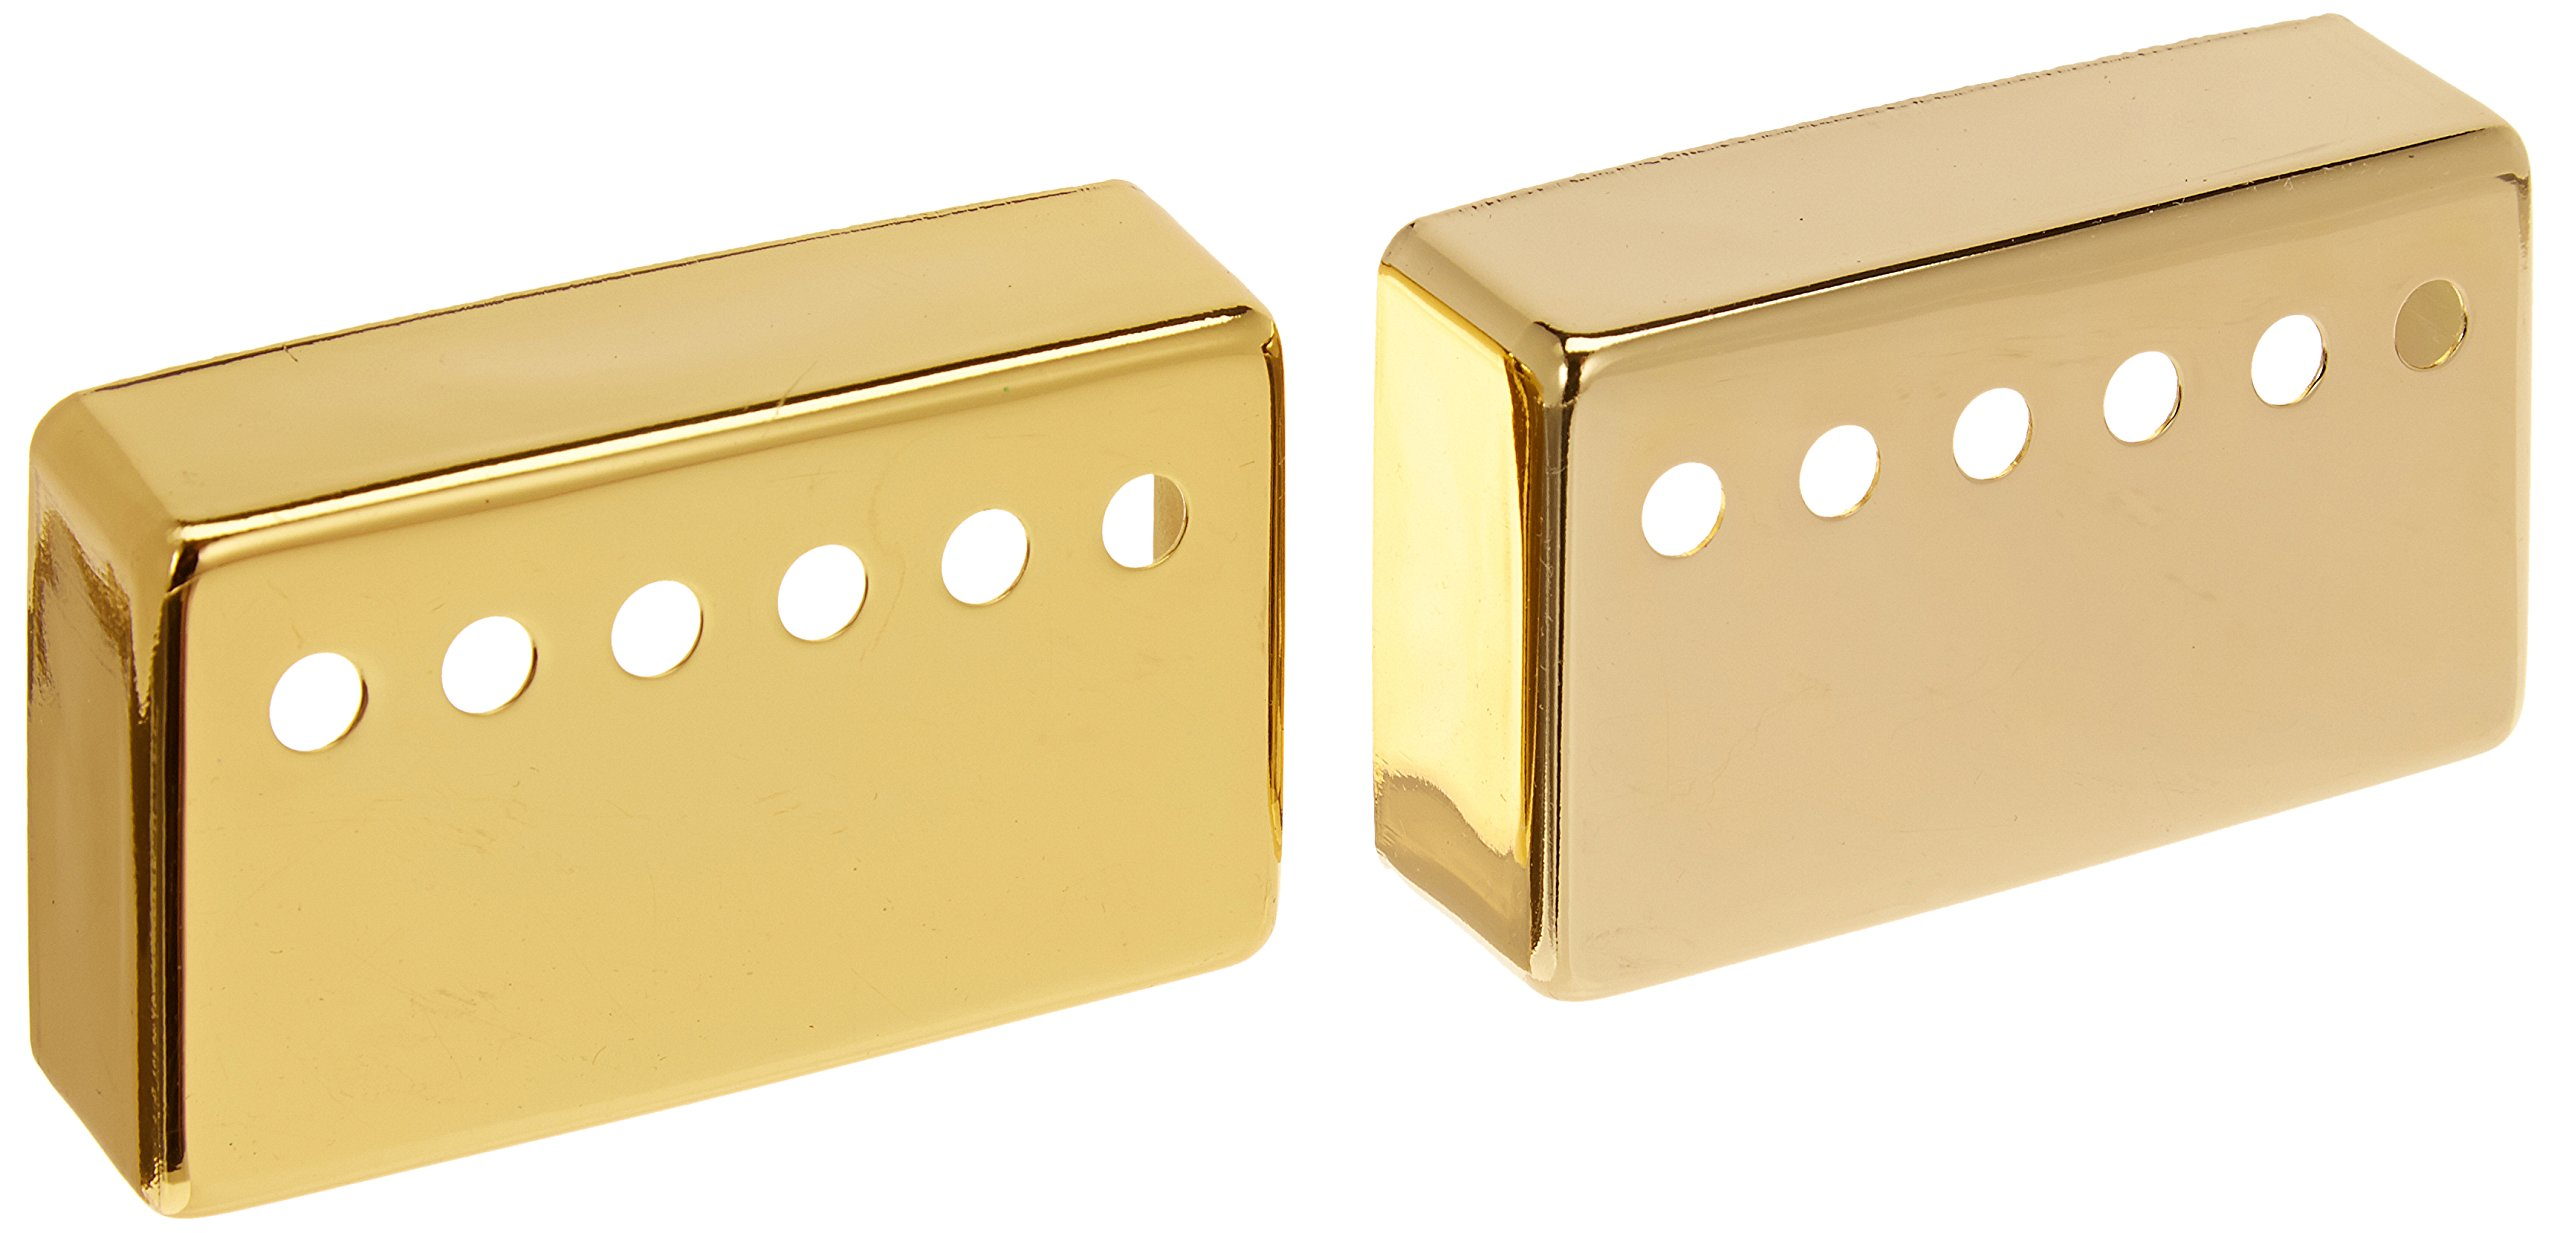 1-Set(2Pcs) Humbucker Neck & Bridge Guitar Pickup Covers Gold High Quality 2